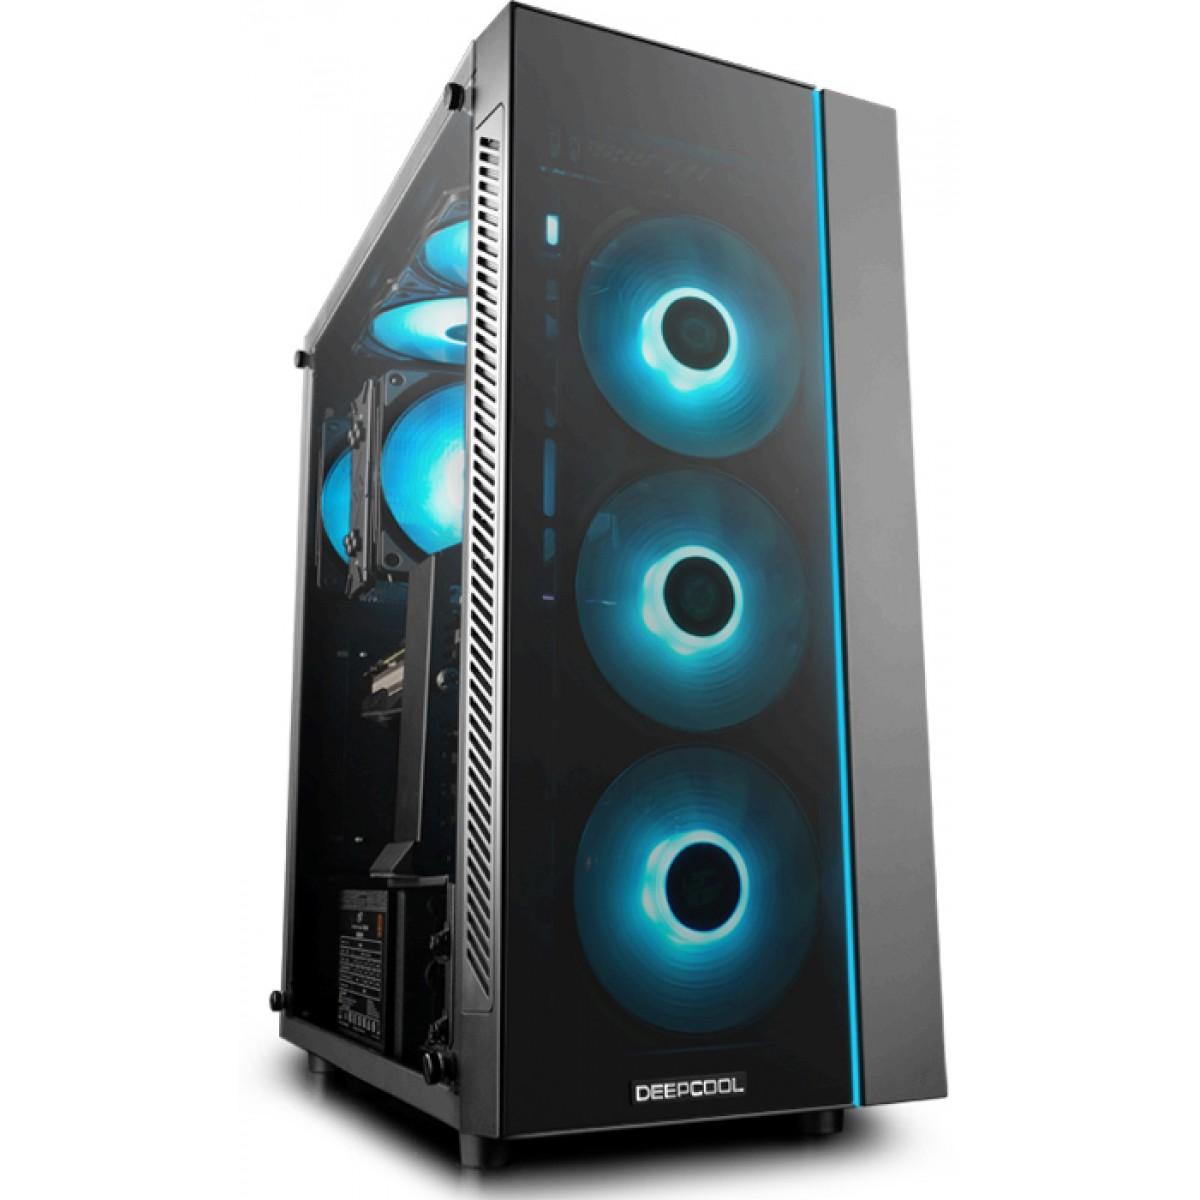 Gabinete Gamer DeepCool Matrexx 55, Mid Tower, Vidro Temperado, Black, Sem Fonte, Sem Fan, DP-ATX-MATREXX55